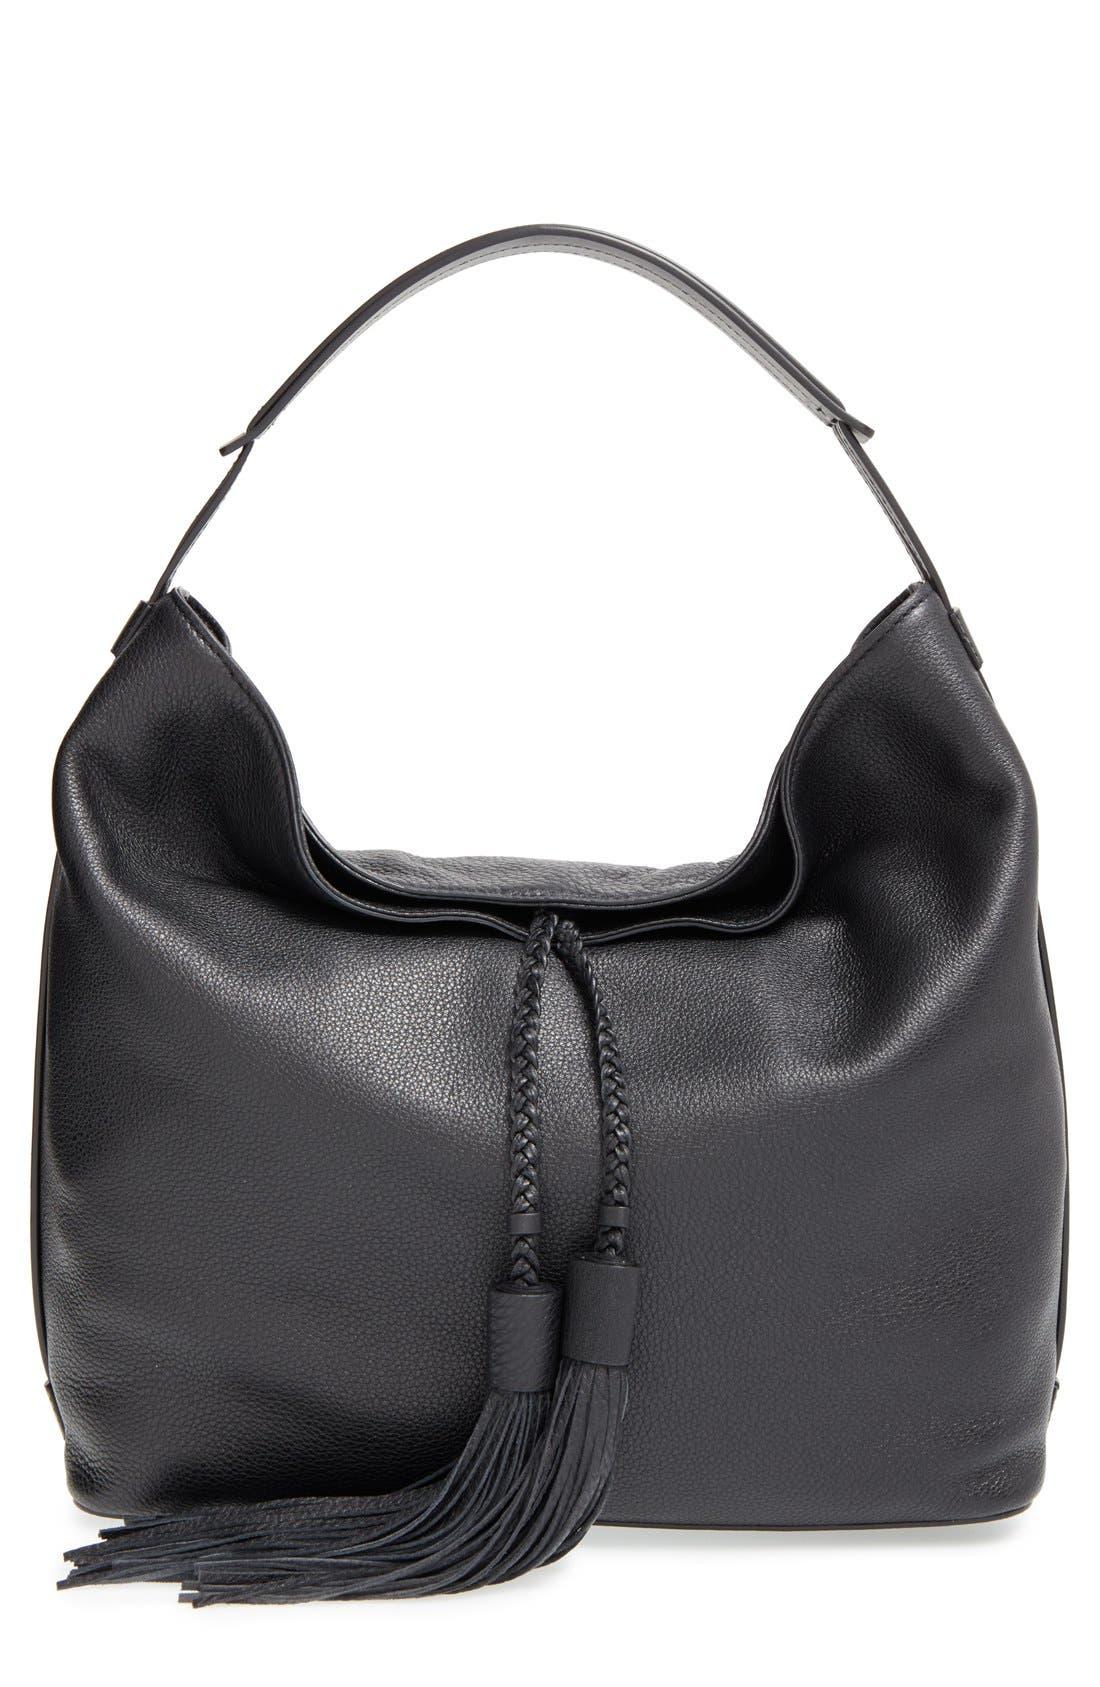 REBECCA MINKOFF 'Isobel' Tassel Leather Hobo, Main, color, 001